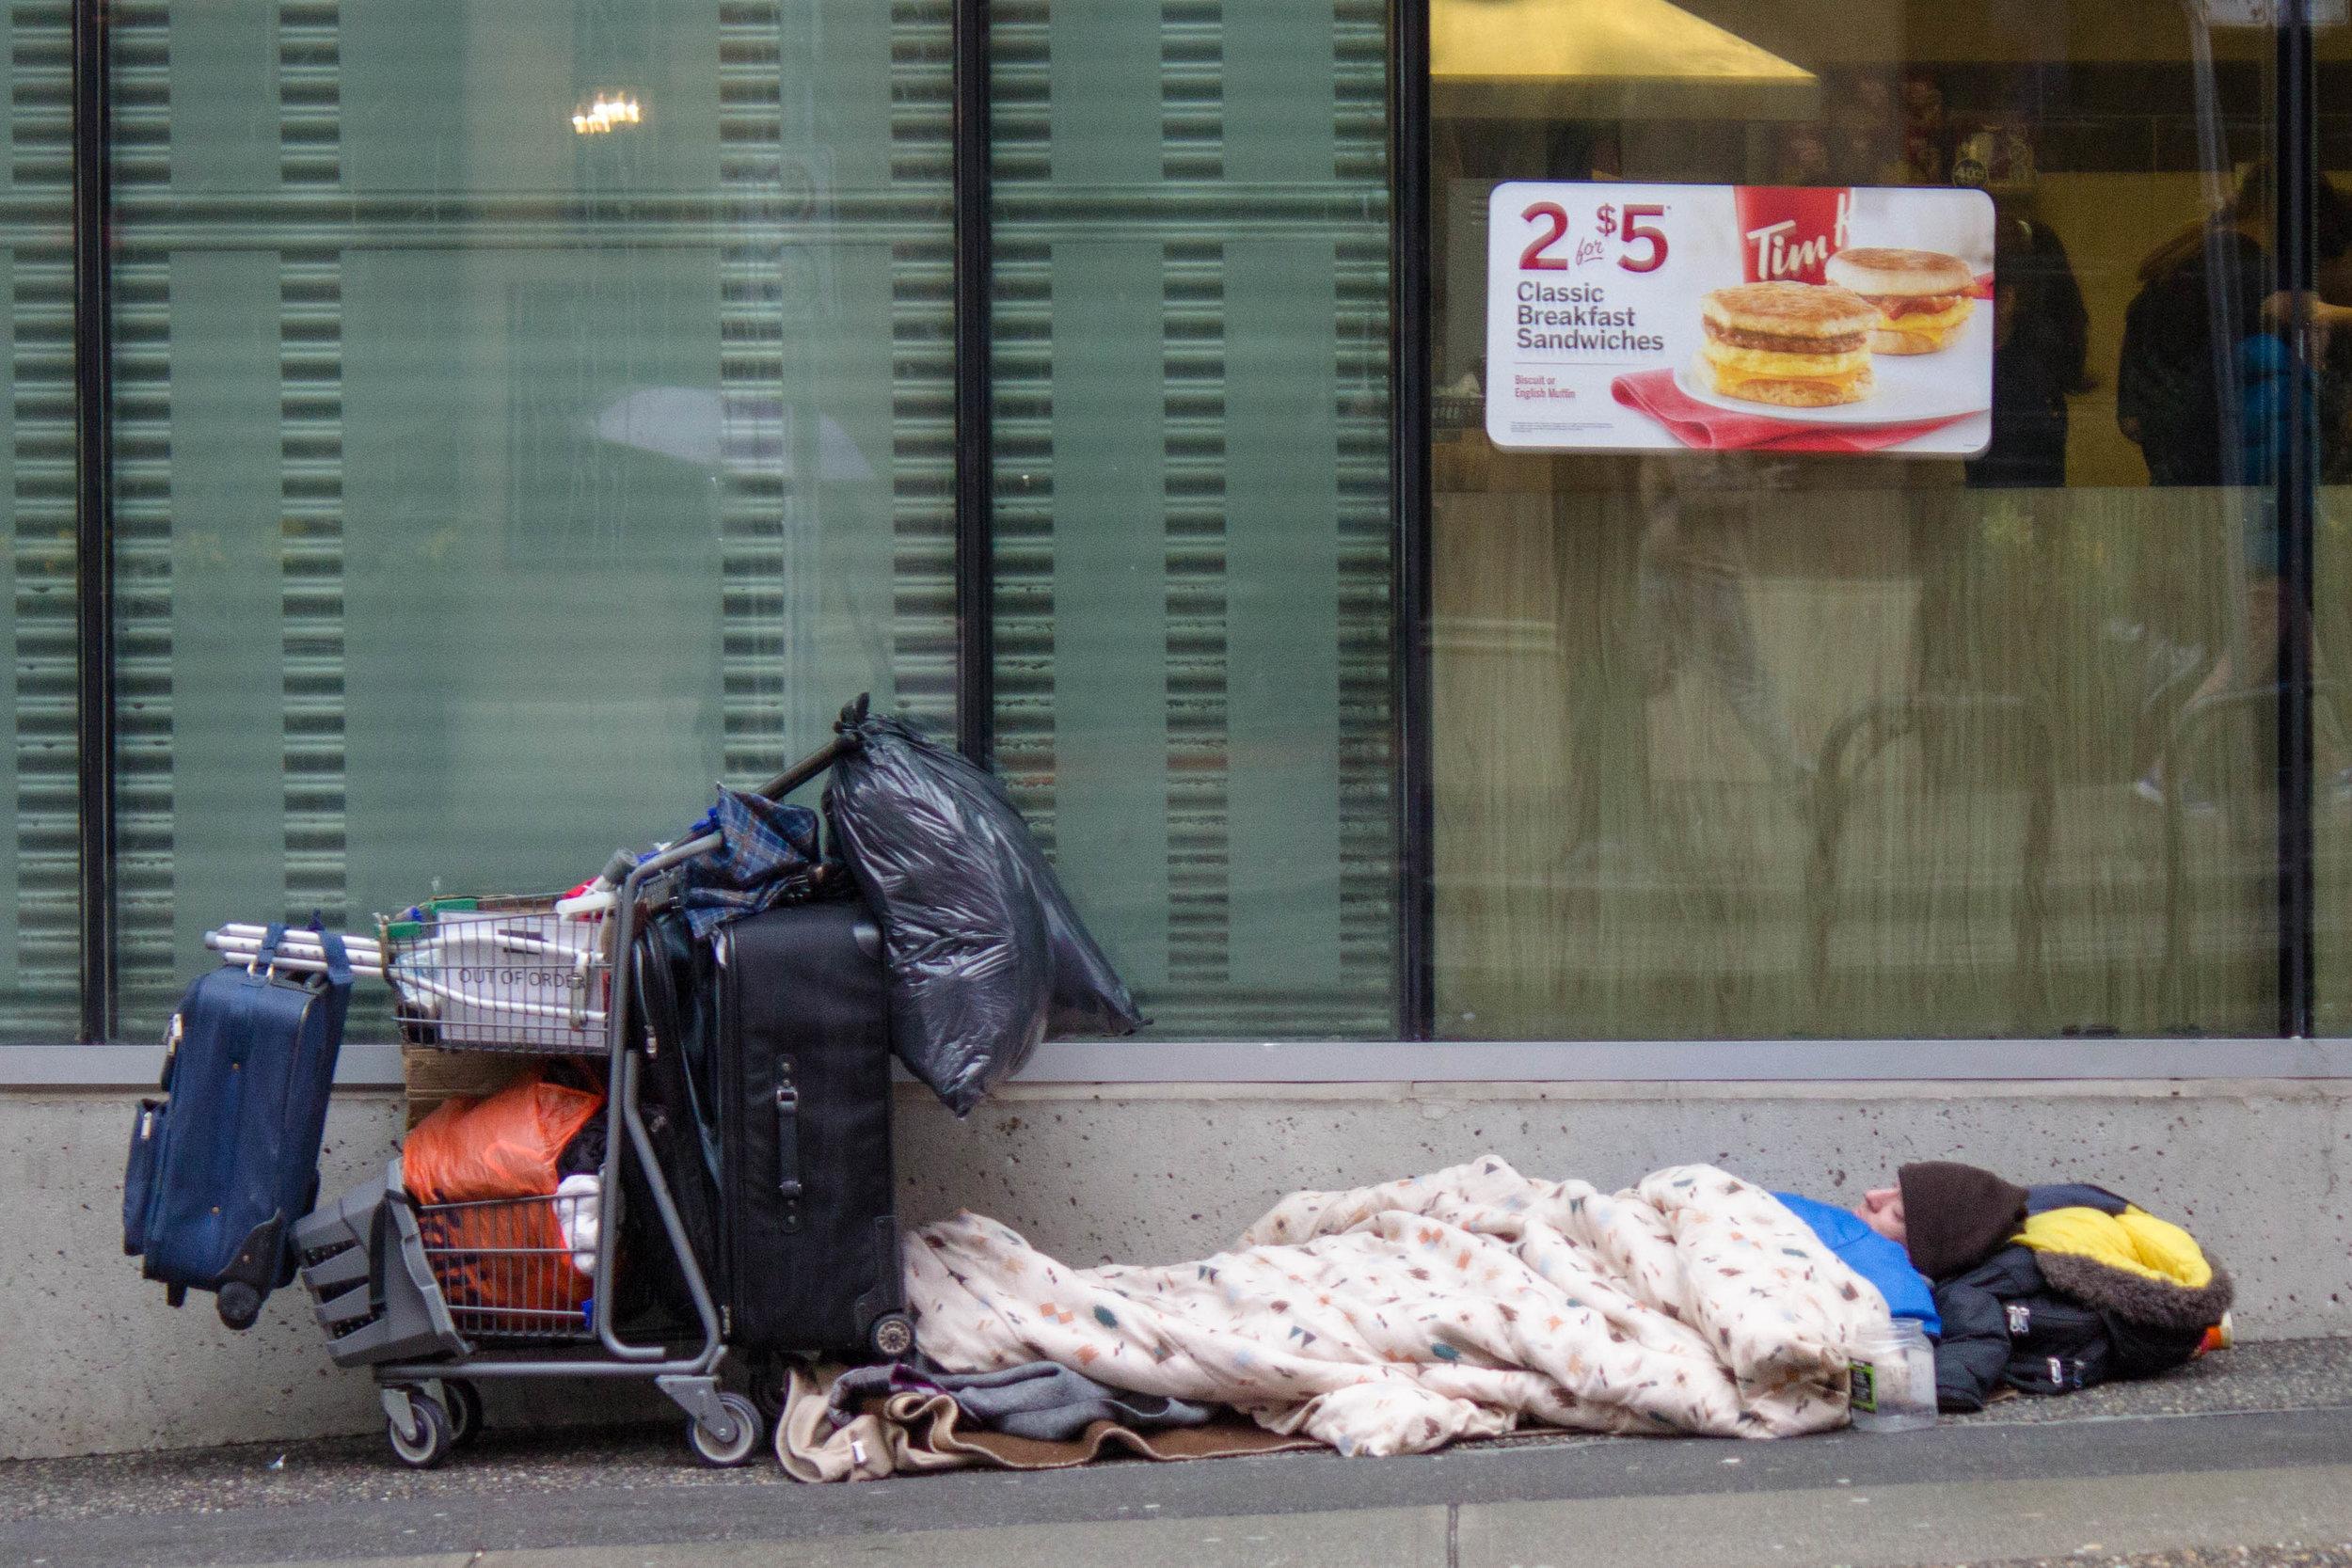 20180308 Street Sleepers 8744.jpg